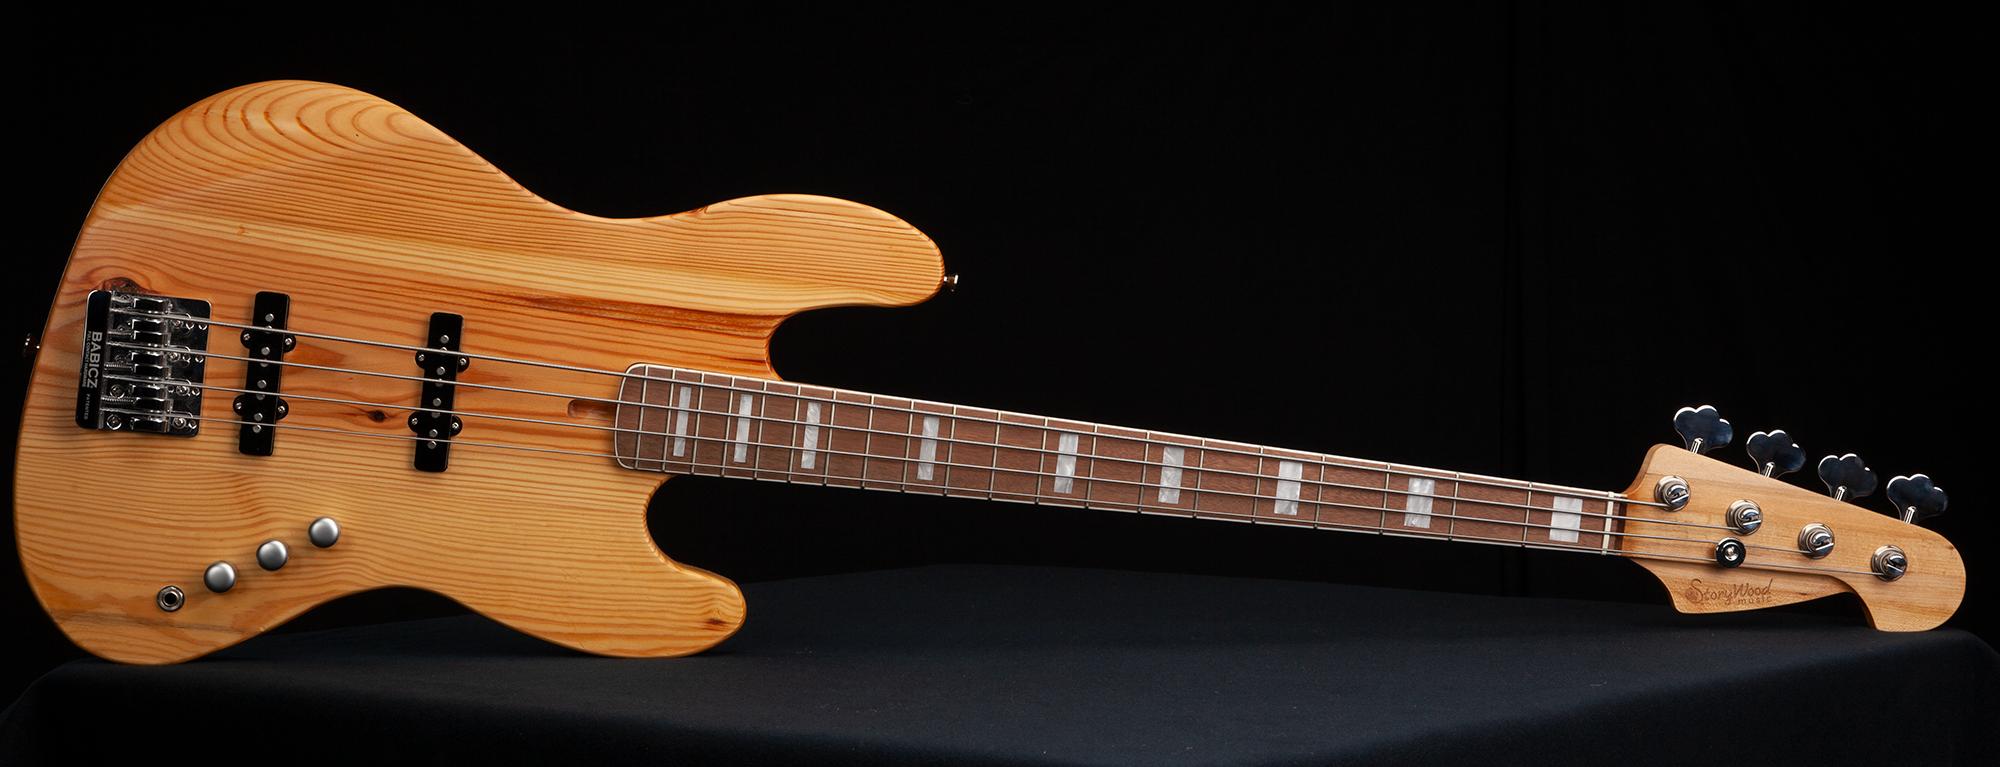 StoryWood Standard J Bass w/ upgraded neck